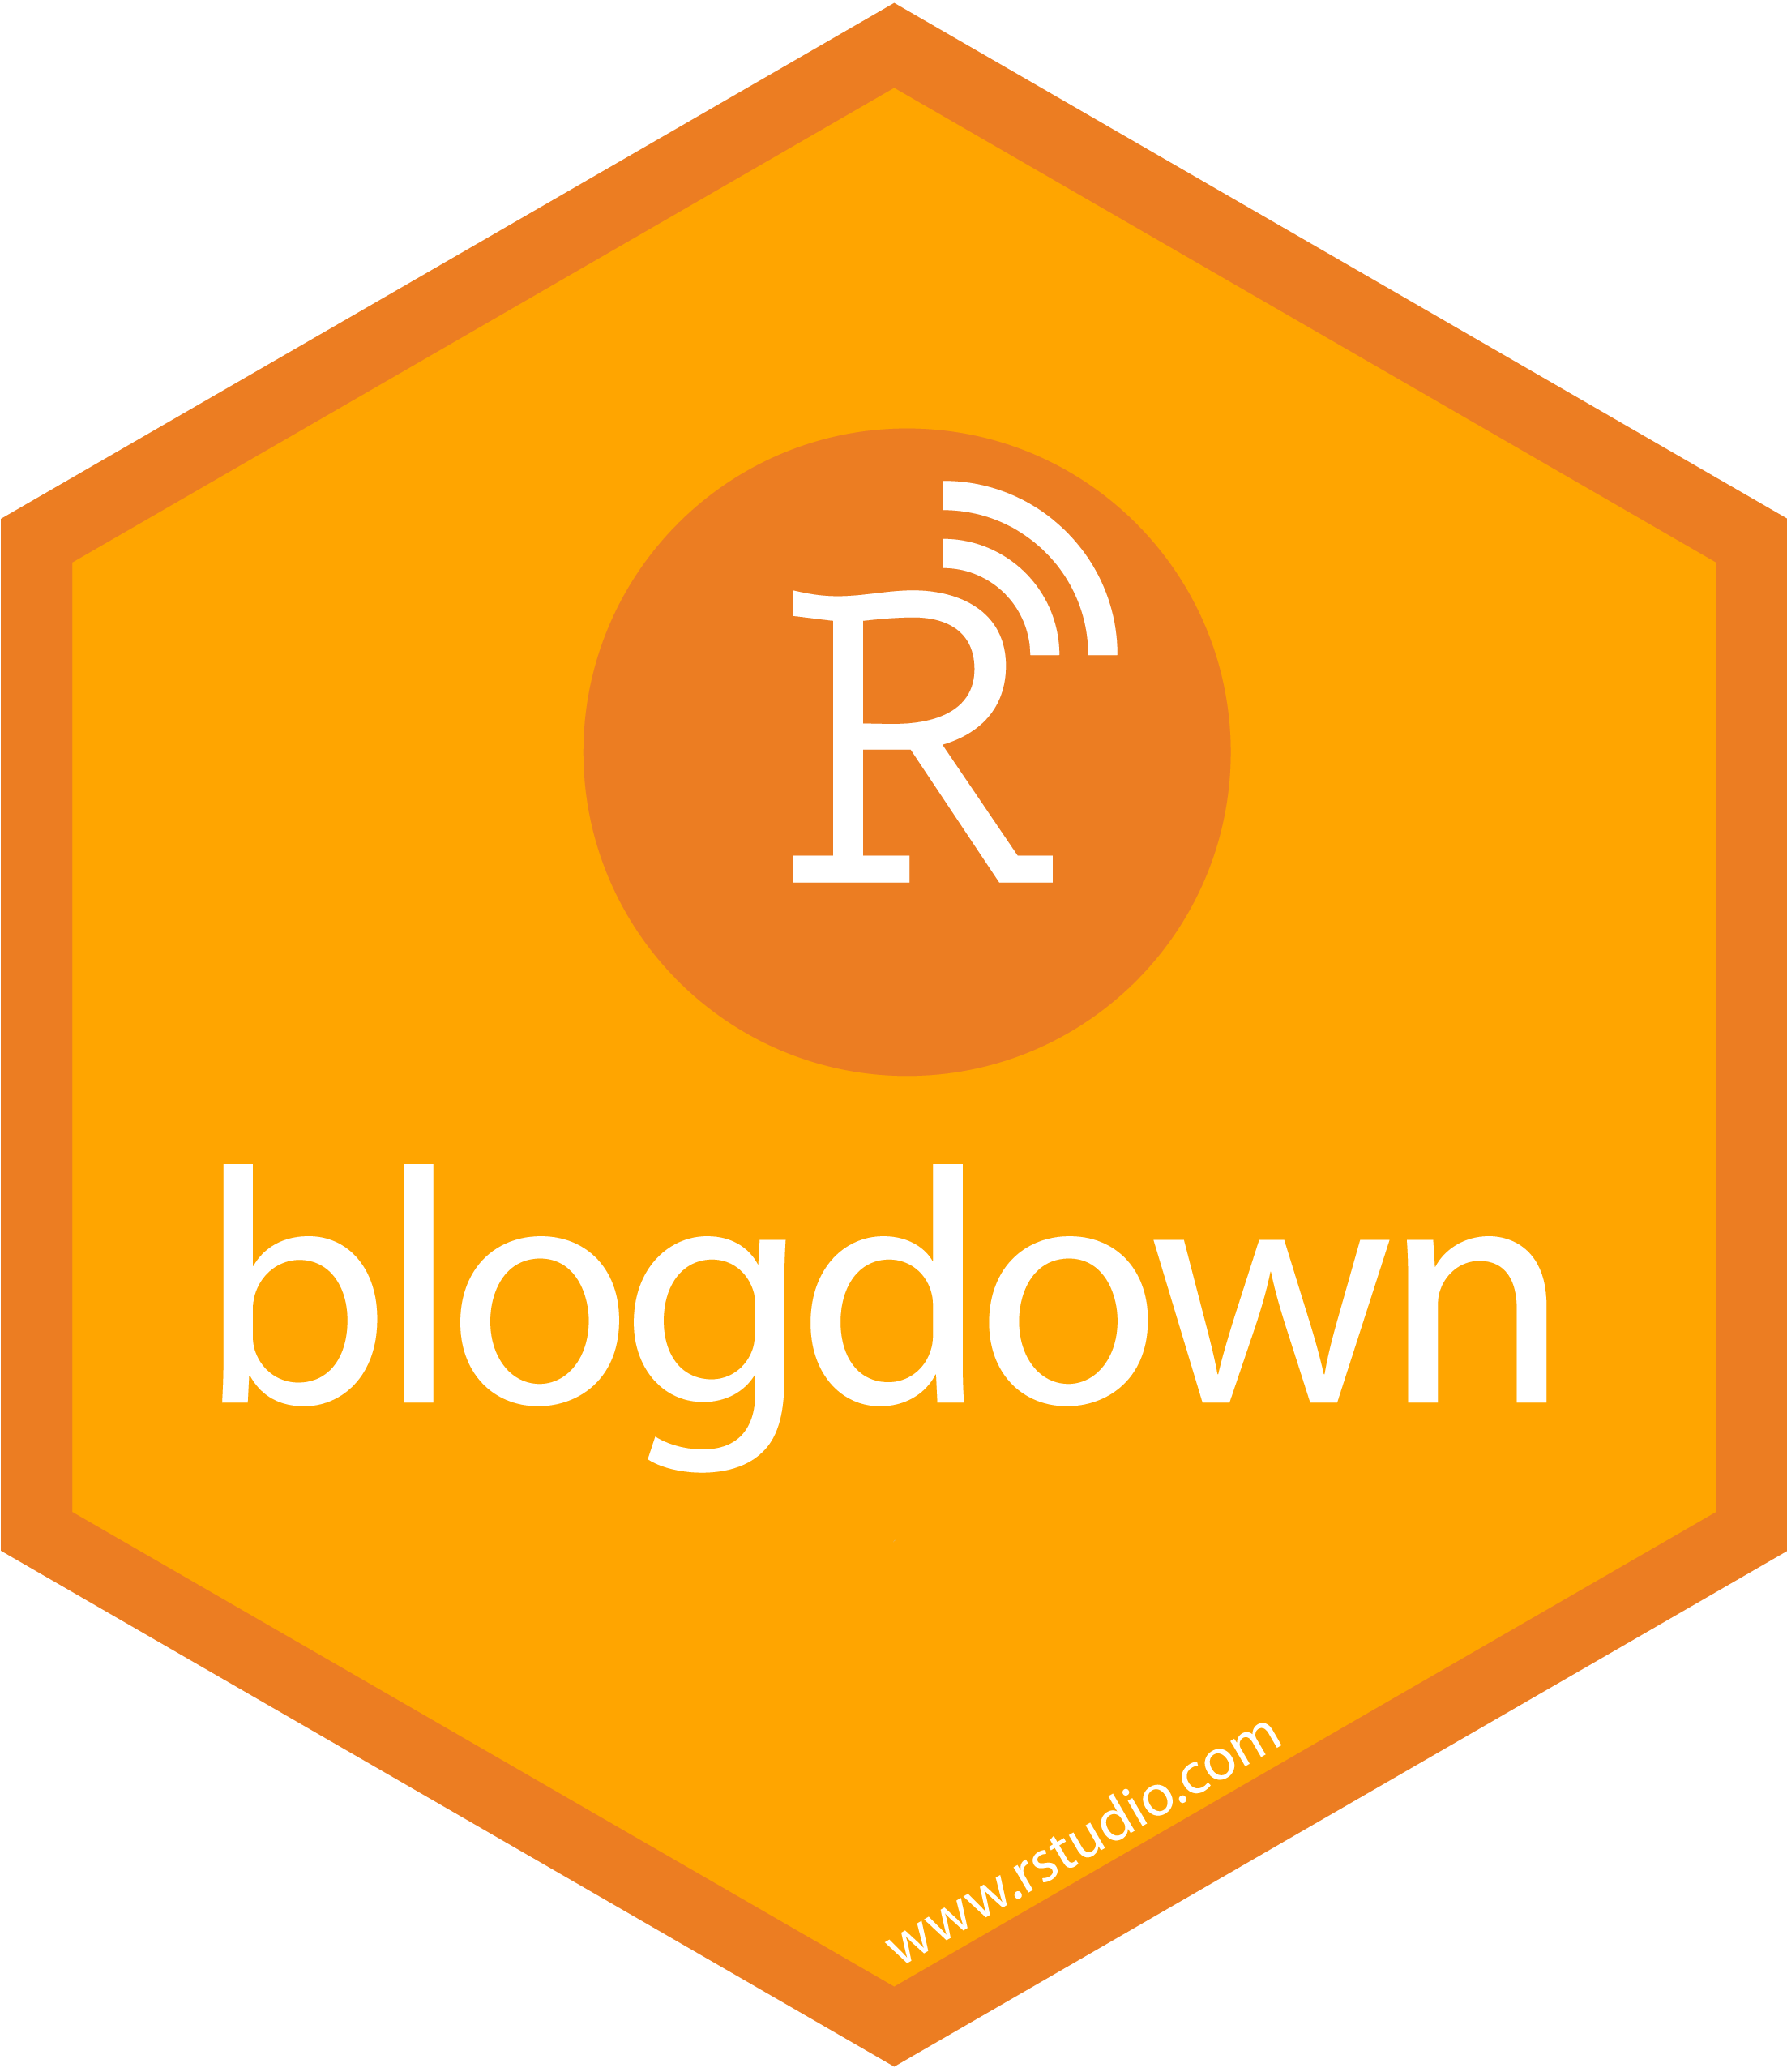 blogdown